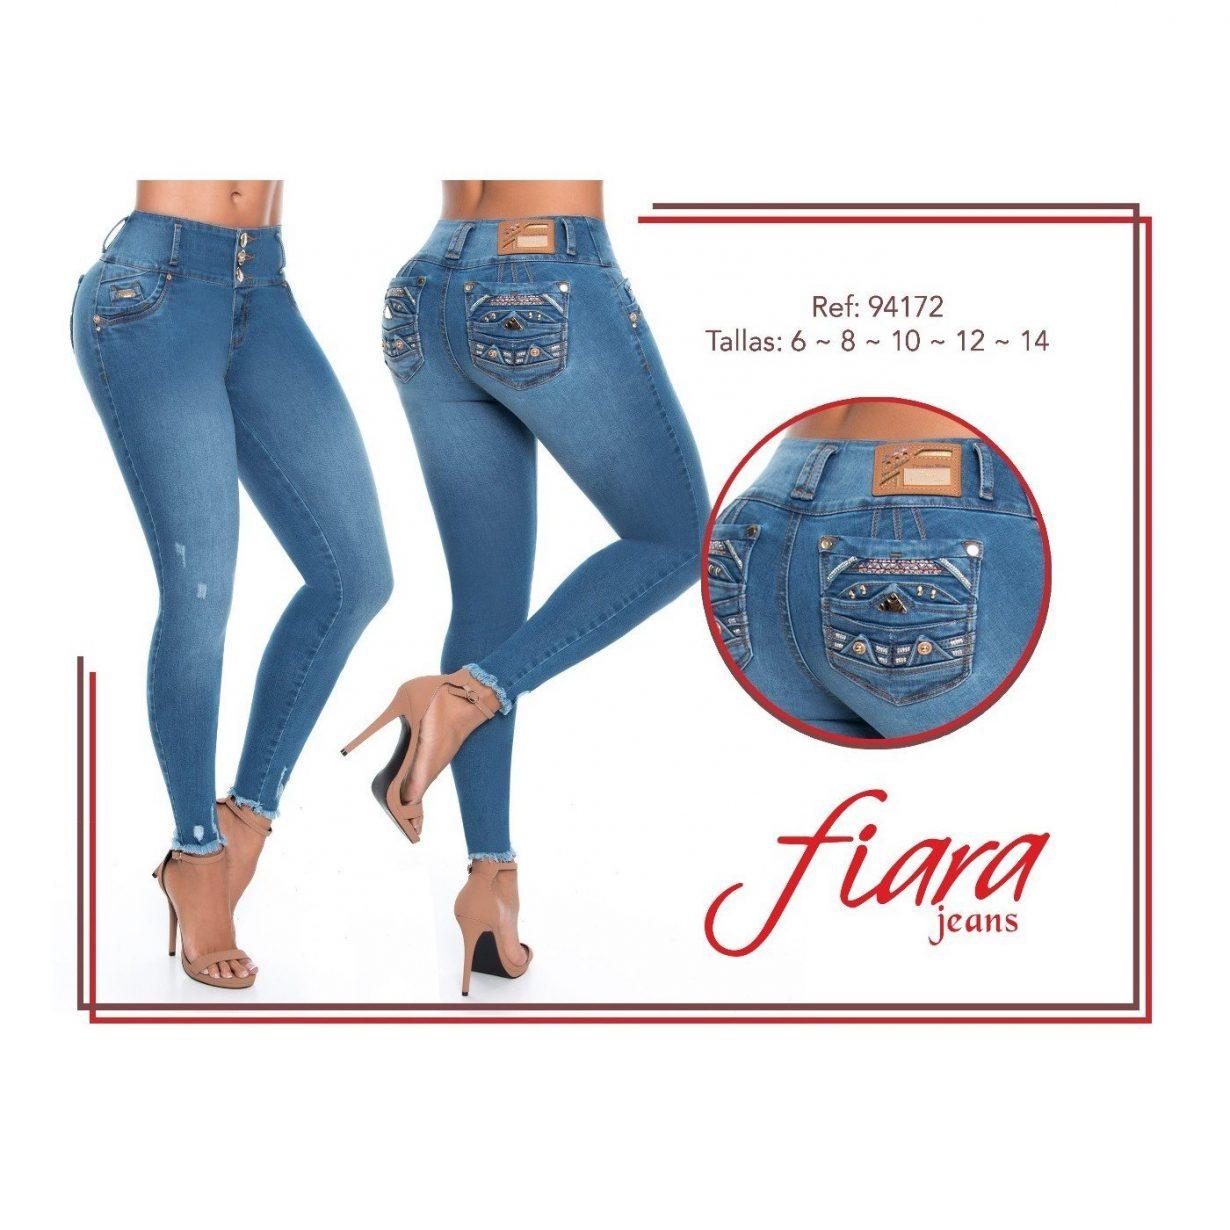 Pantalon Colombuano Fiara Jeans PA94172